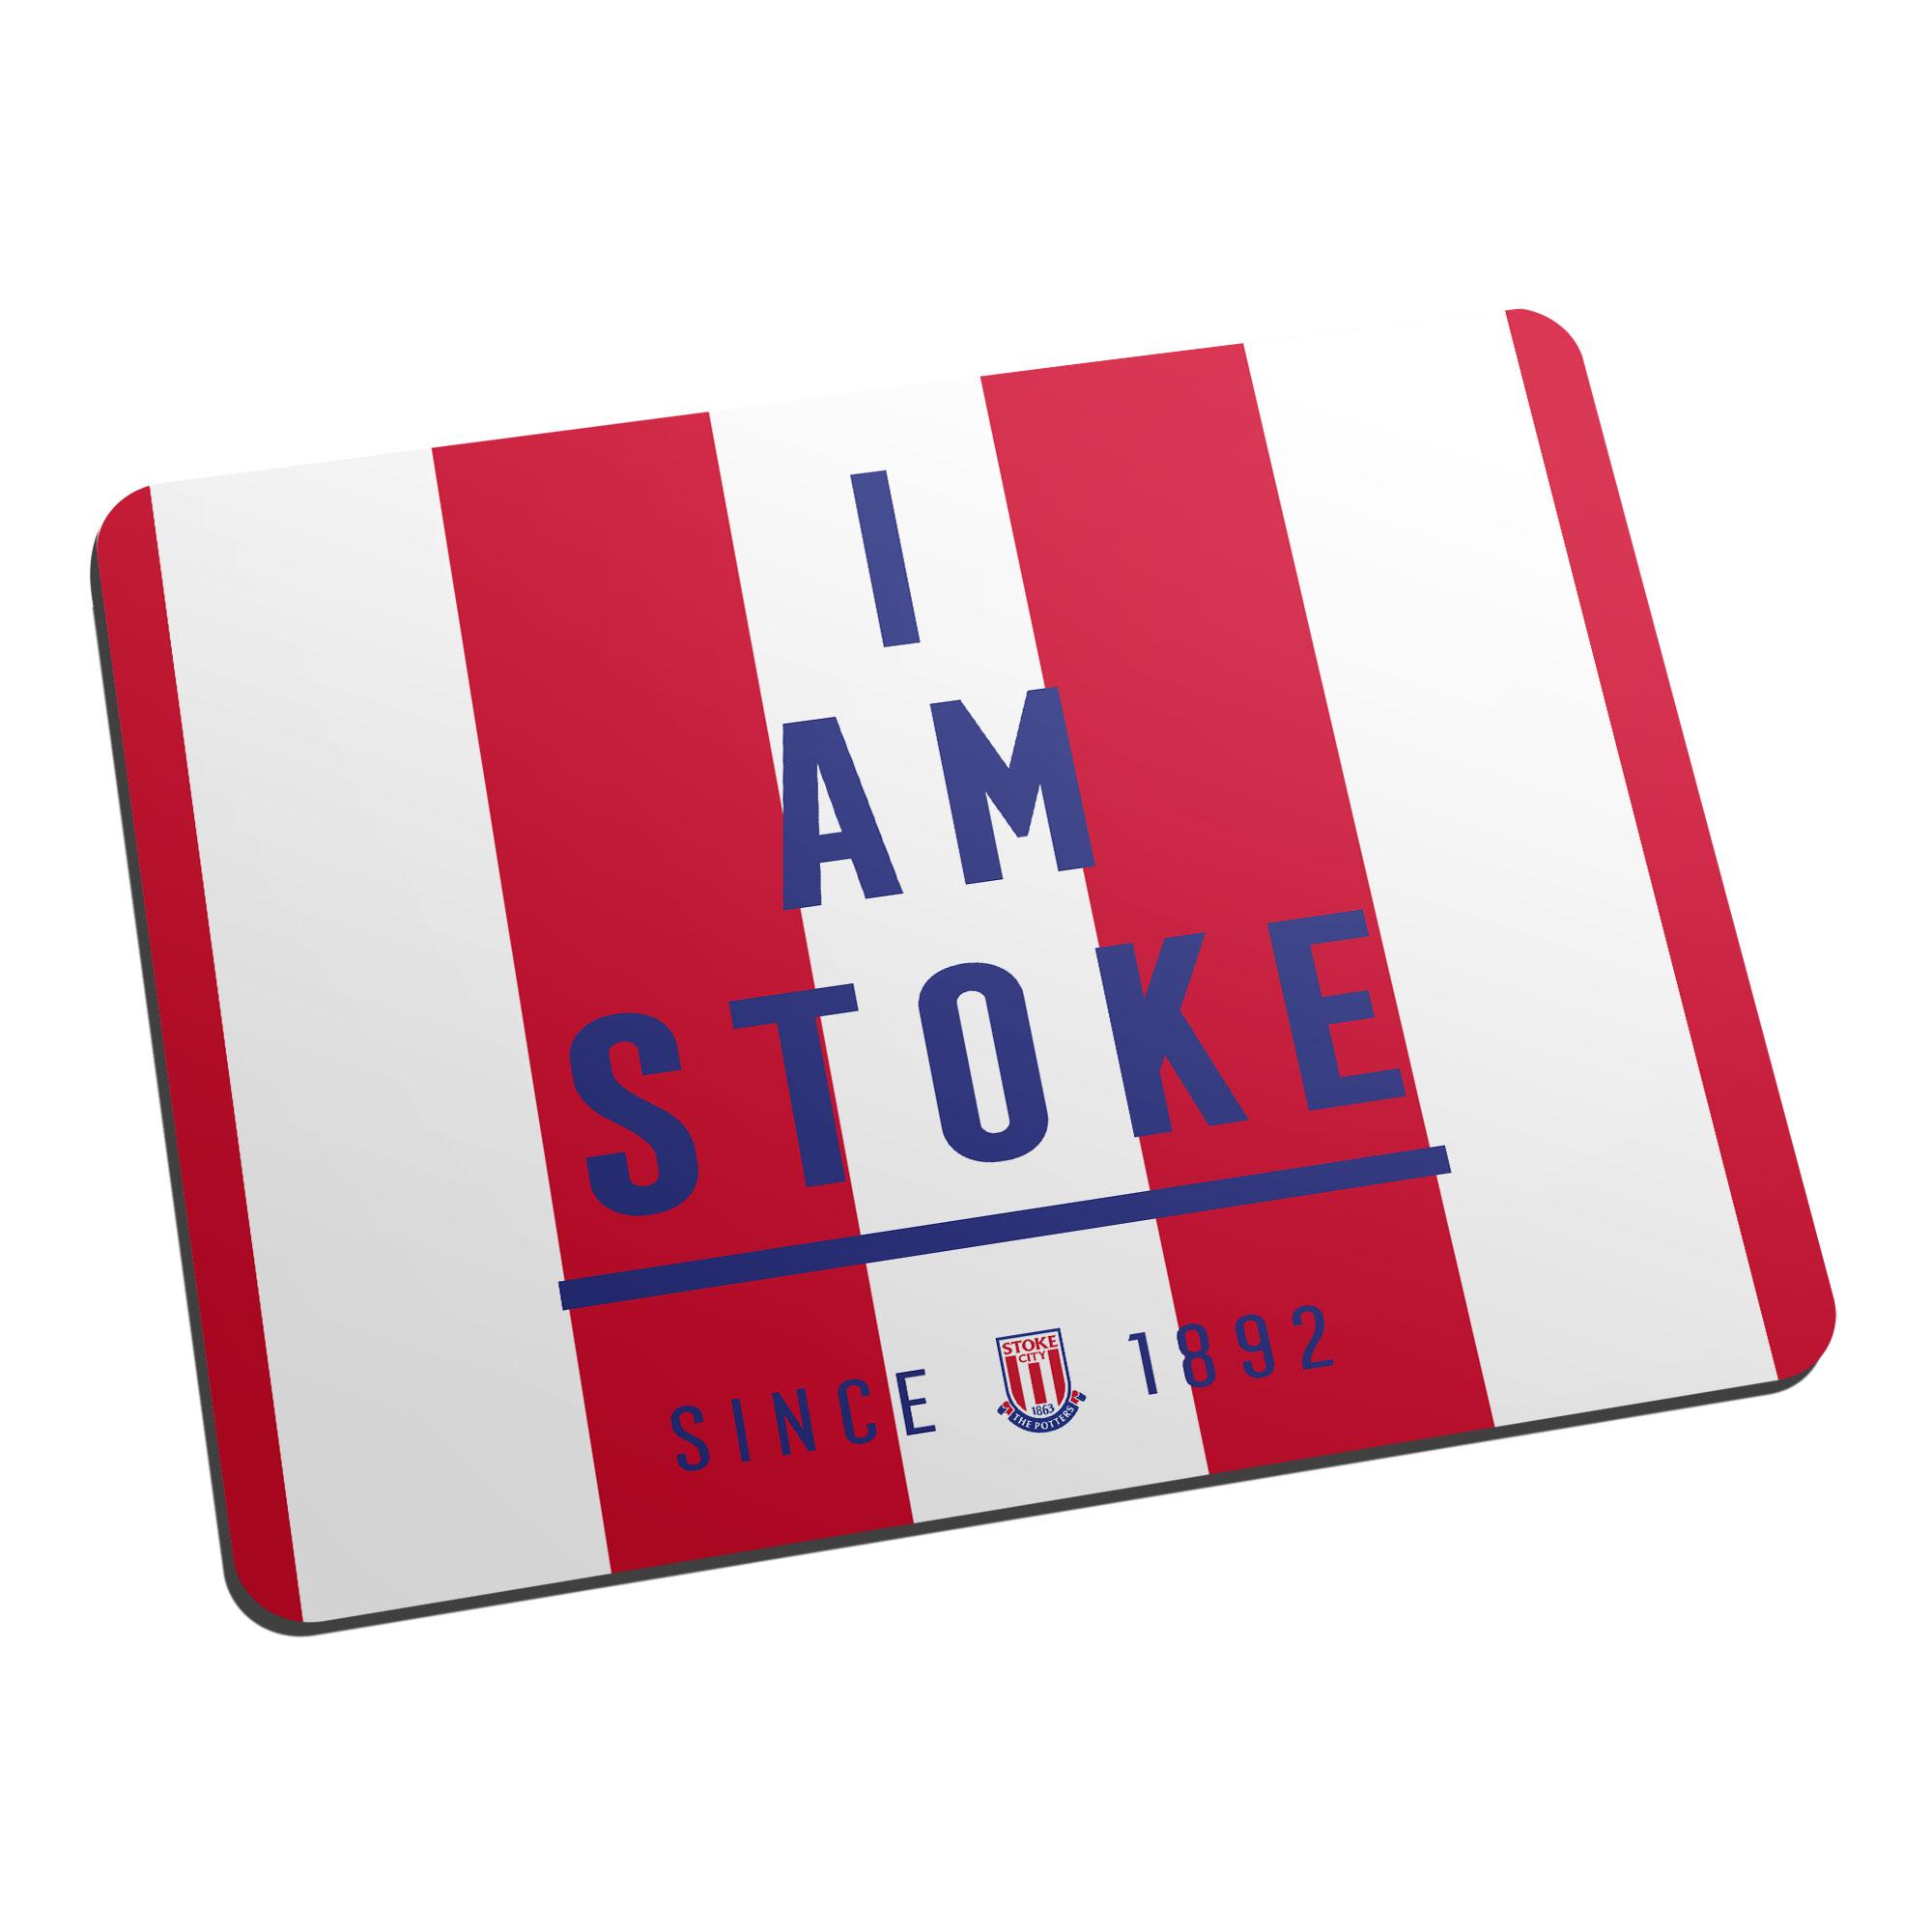 Stoke City FC I Am Mouse Mat